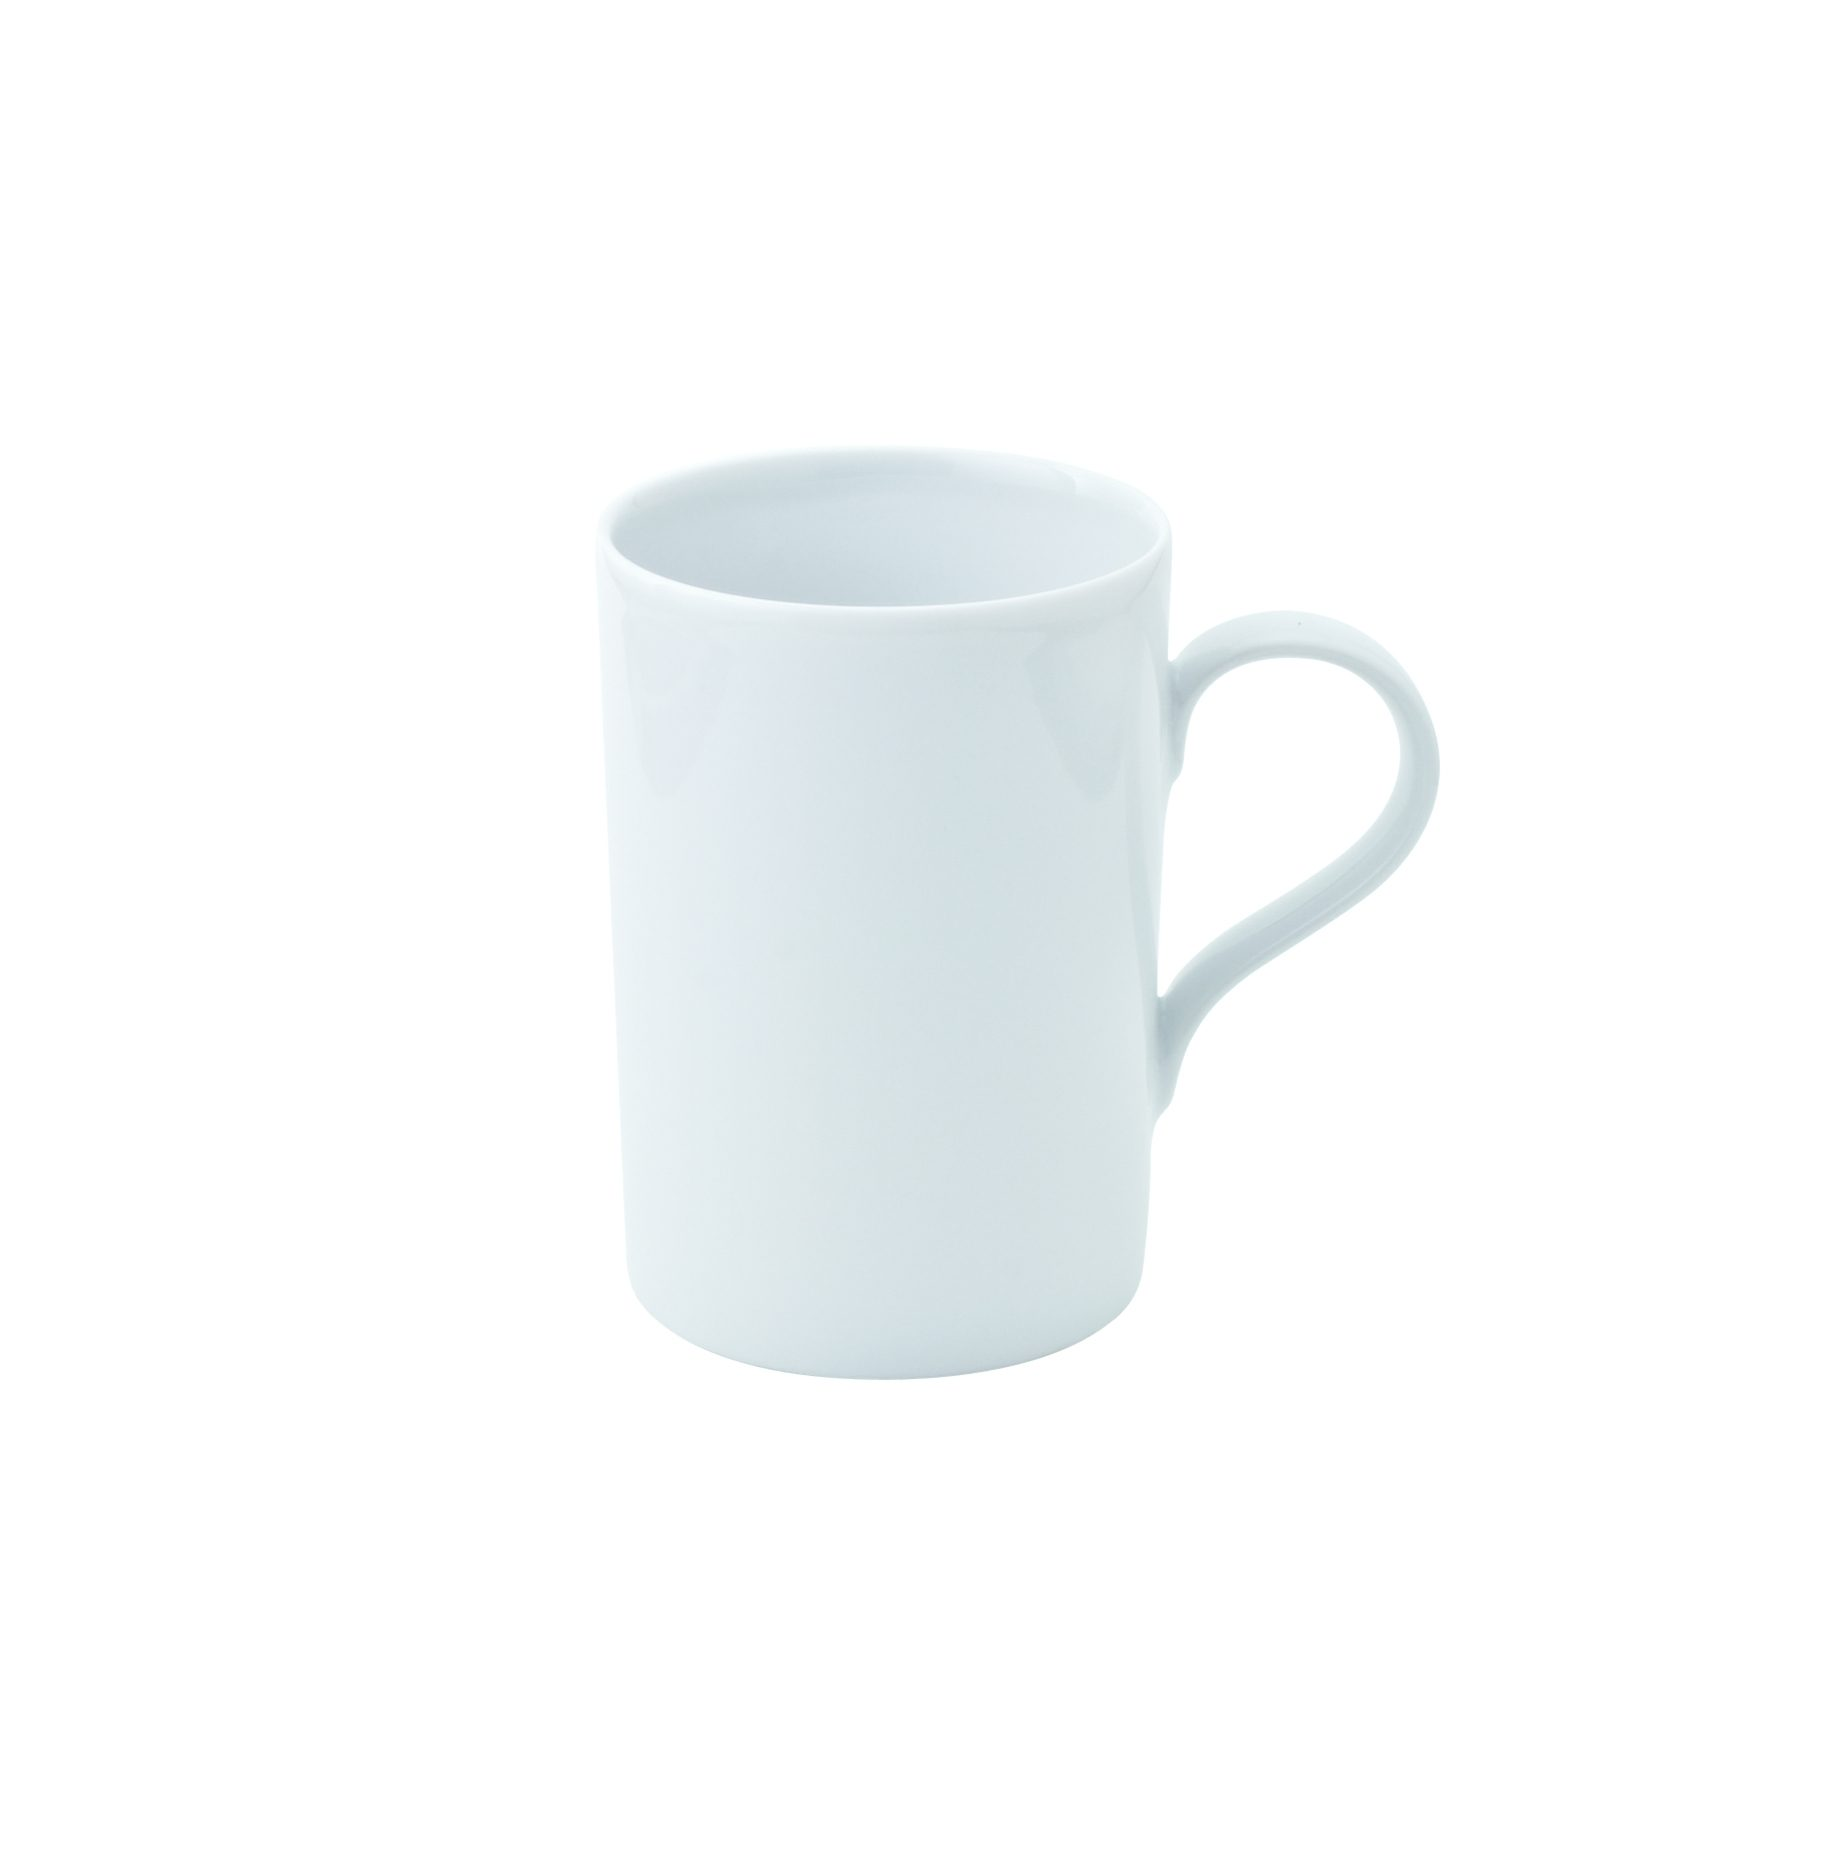 Kahla Kaffeebecher »Aronda«